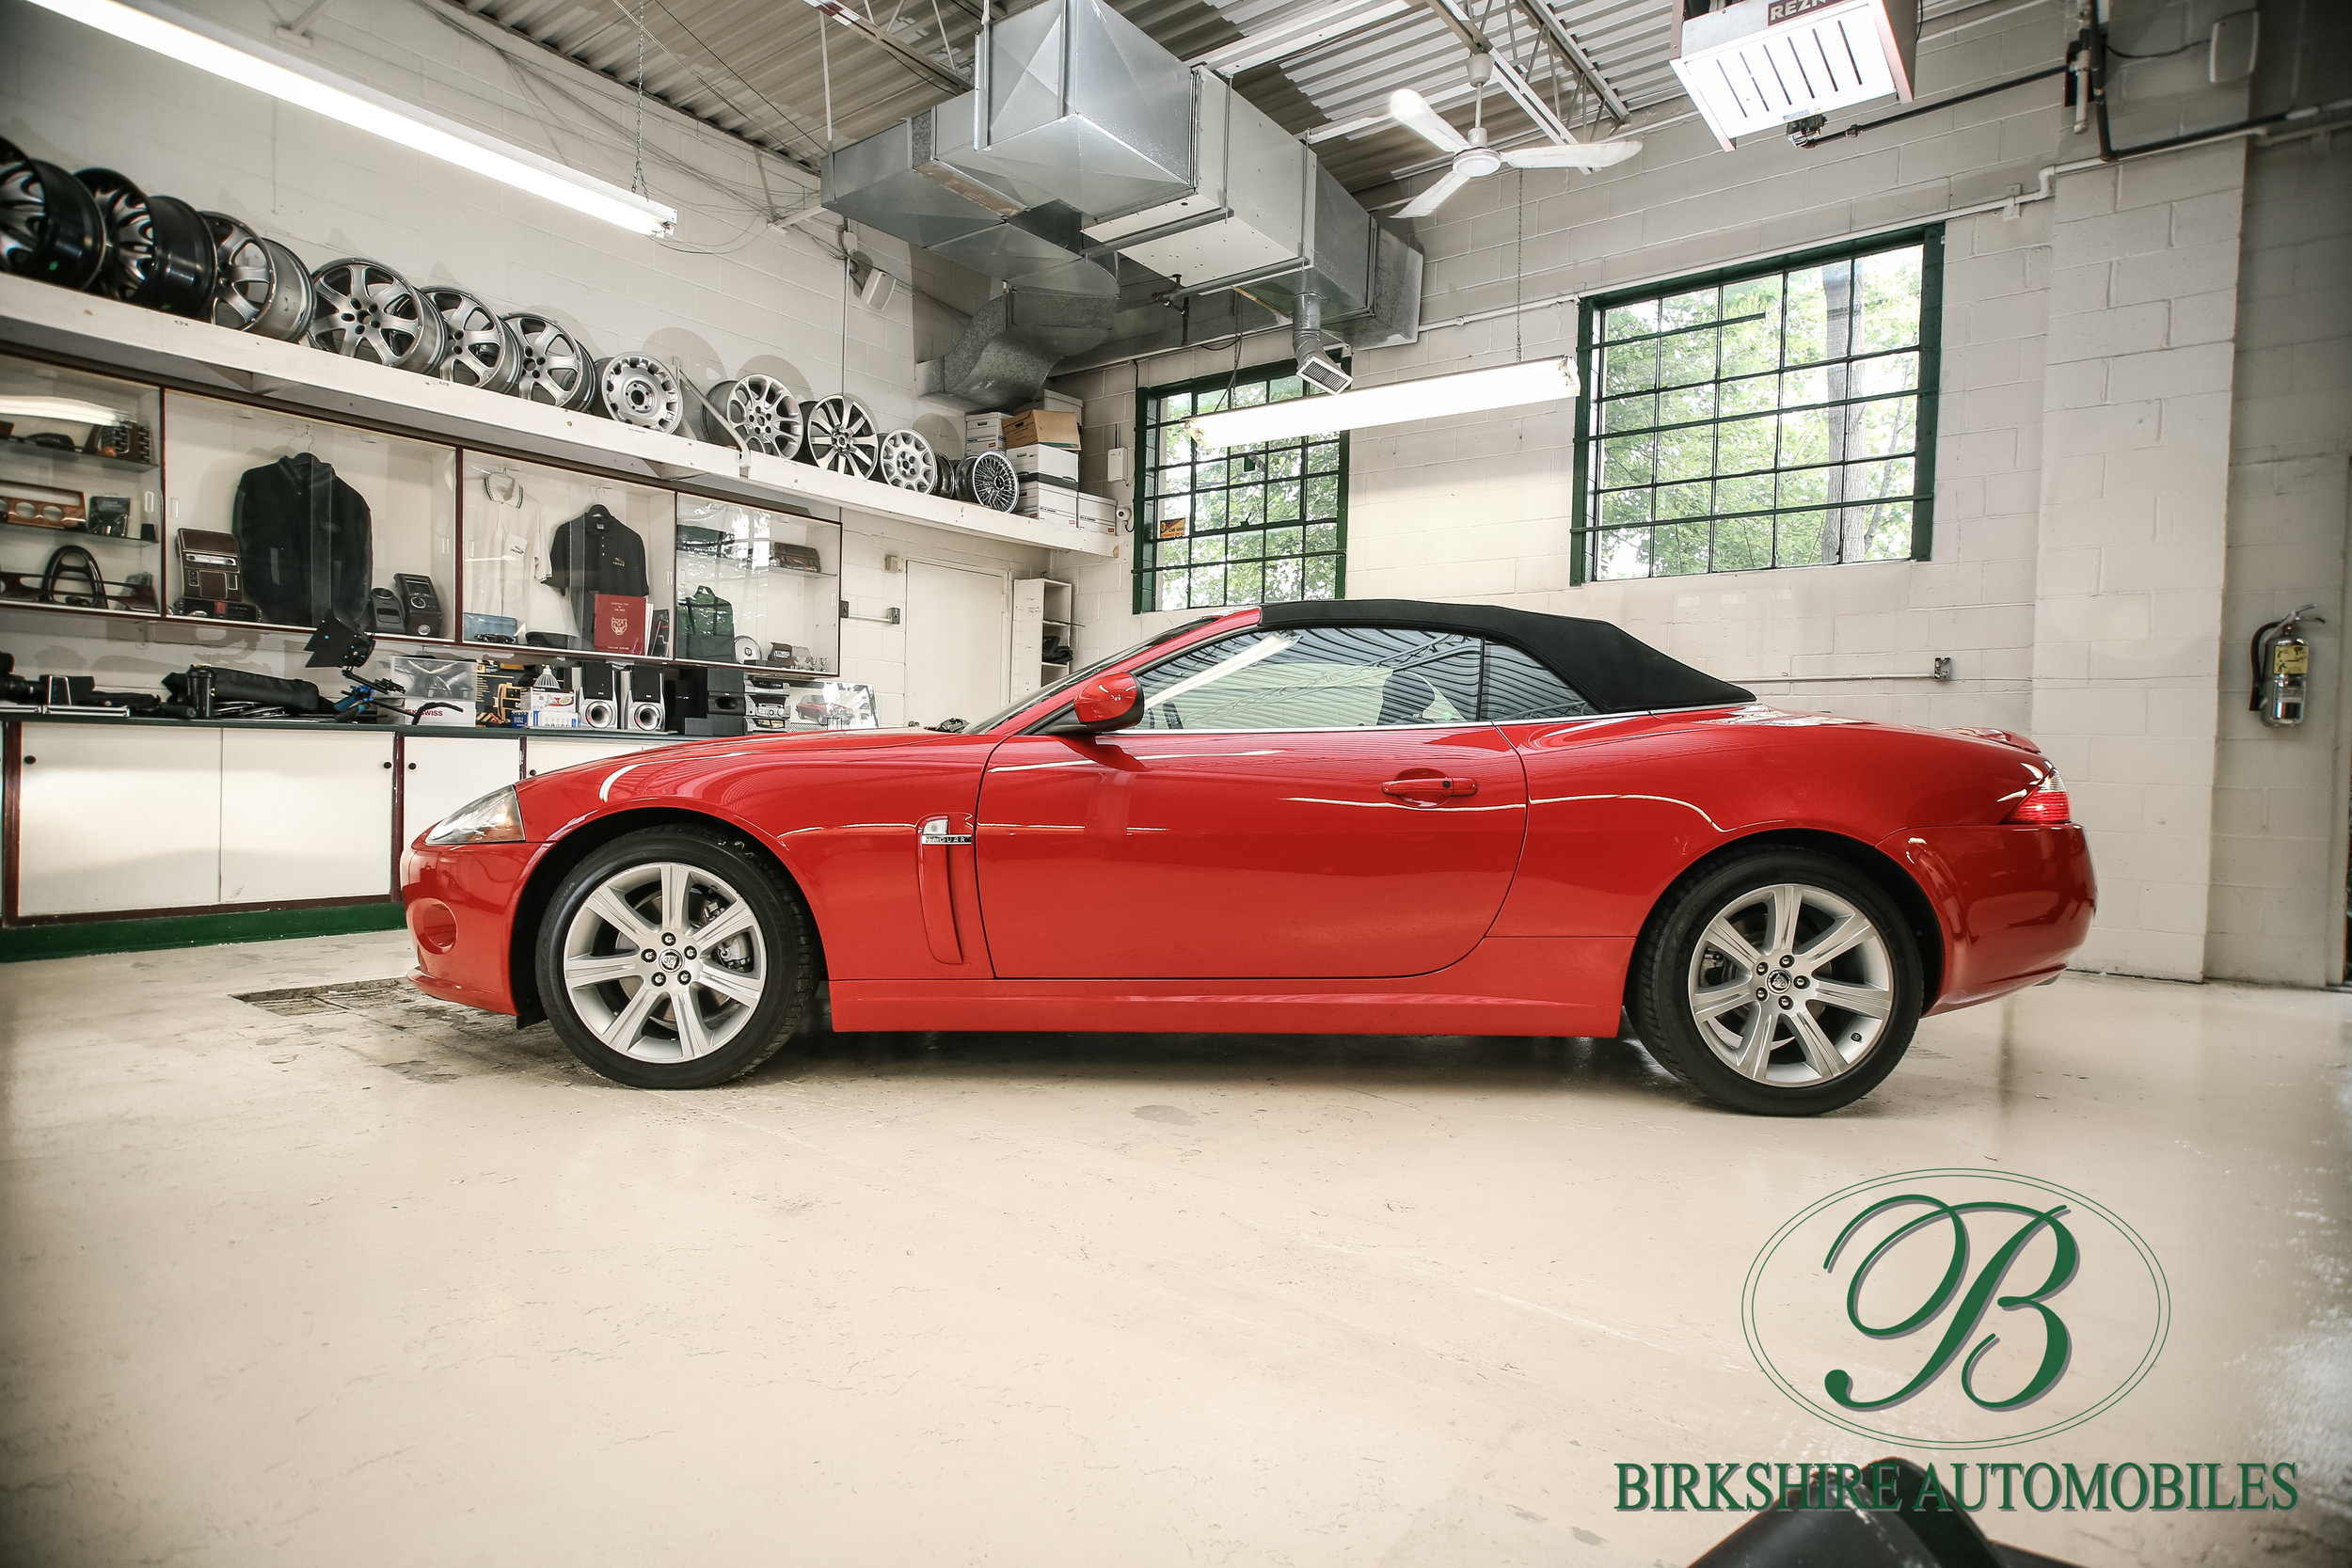 Birkshire Automobiles-69.jpg